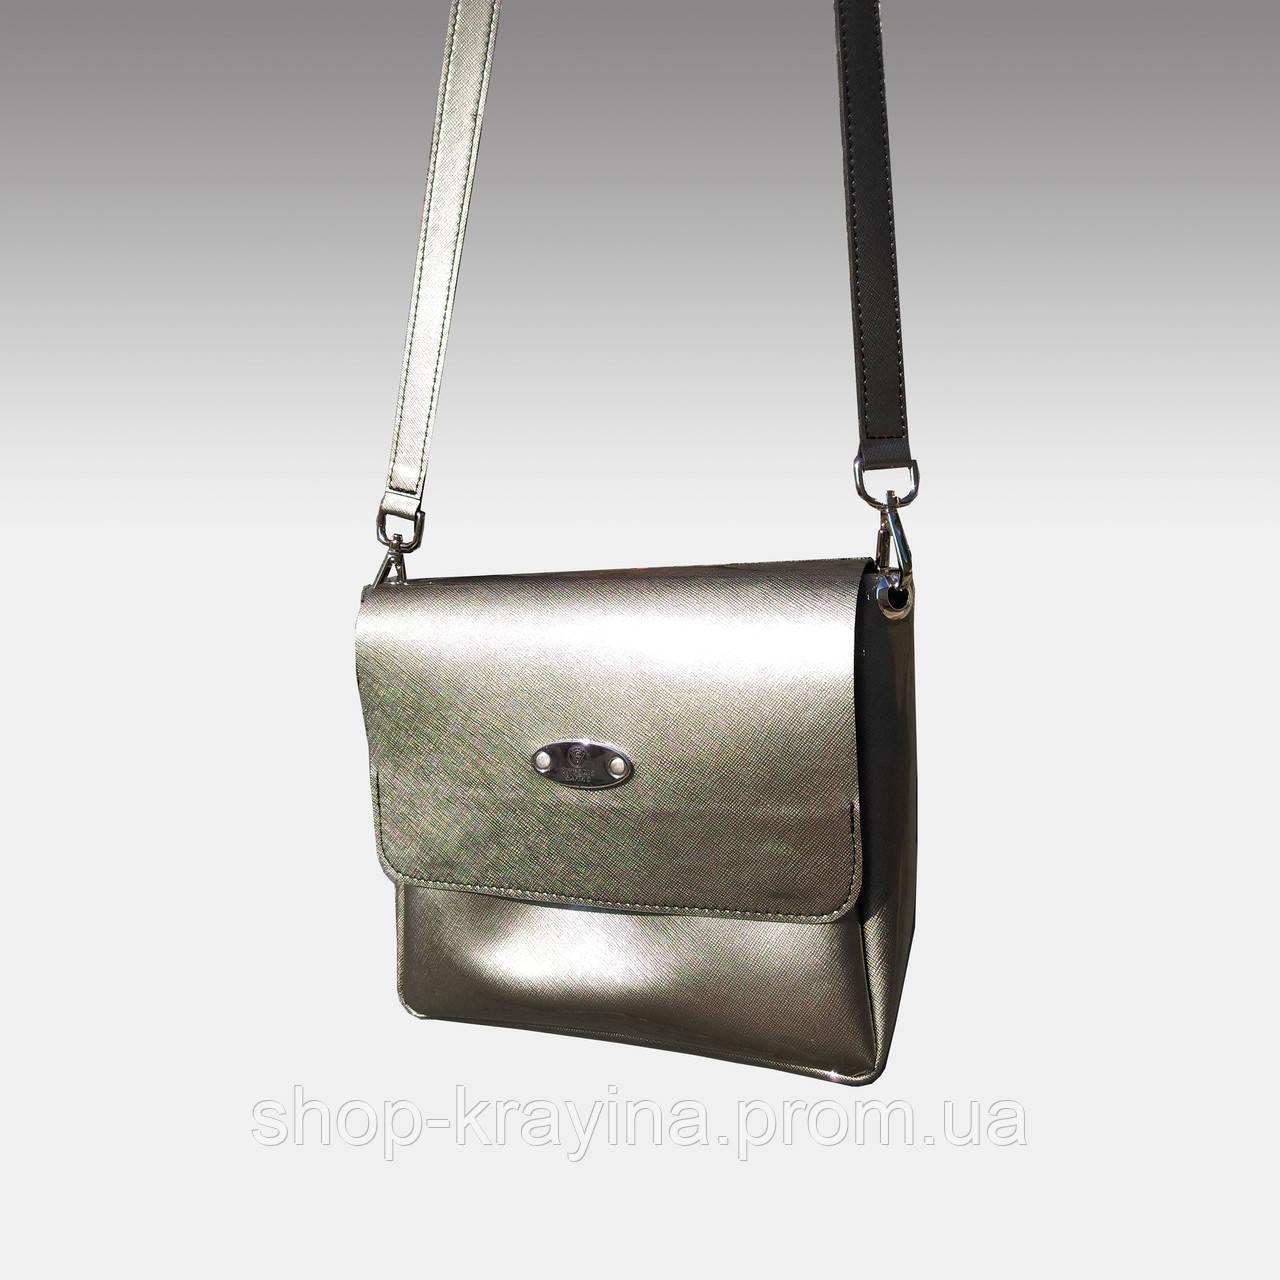 Cумка VS207  silver 20х15 см